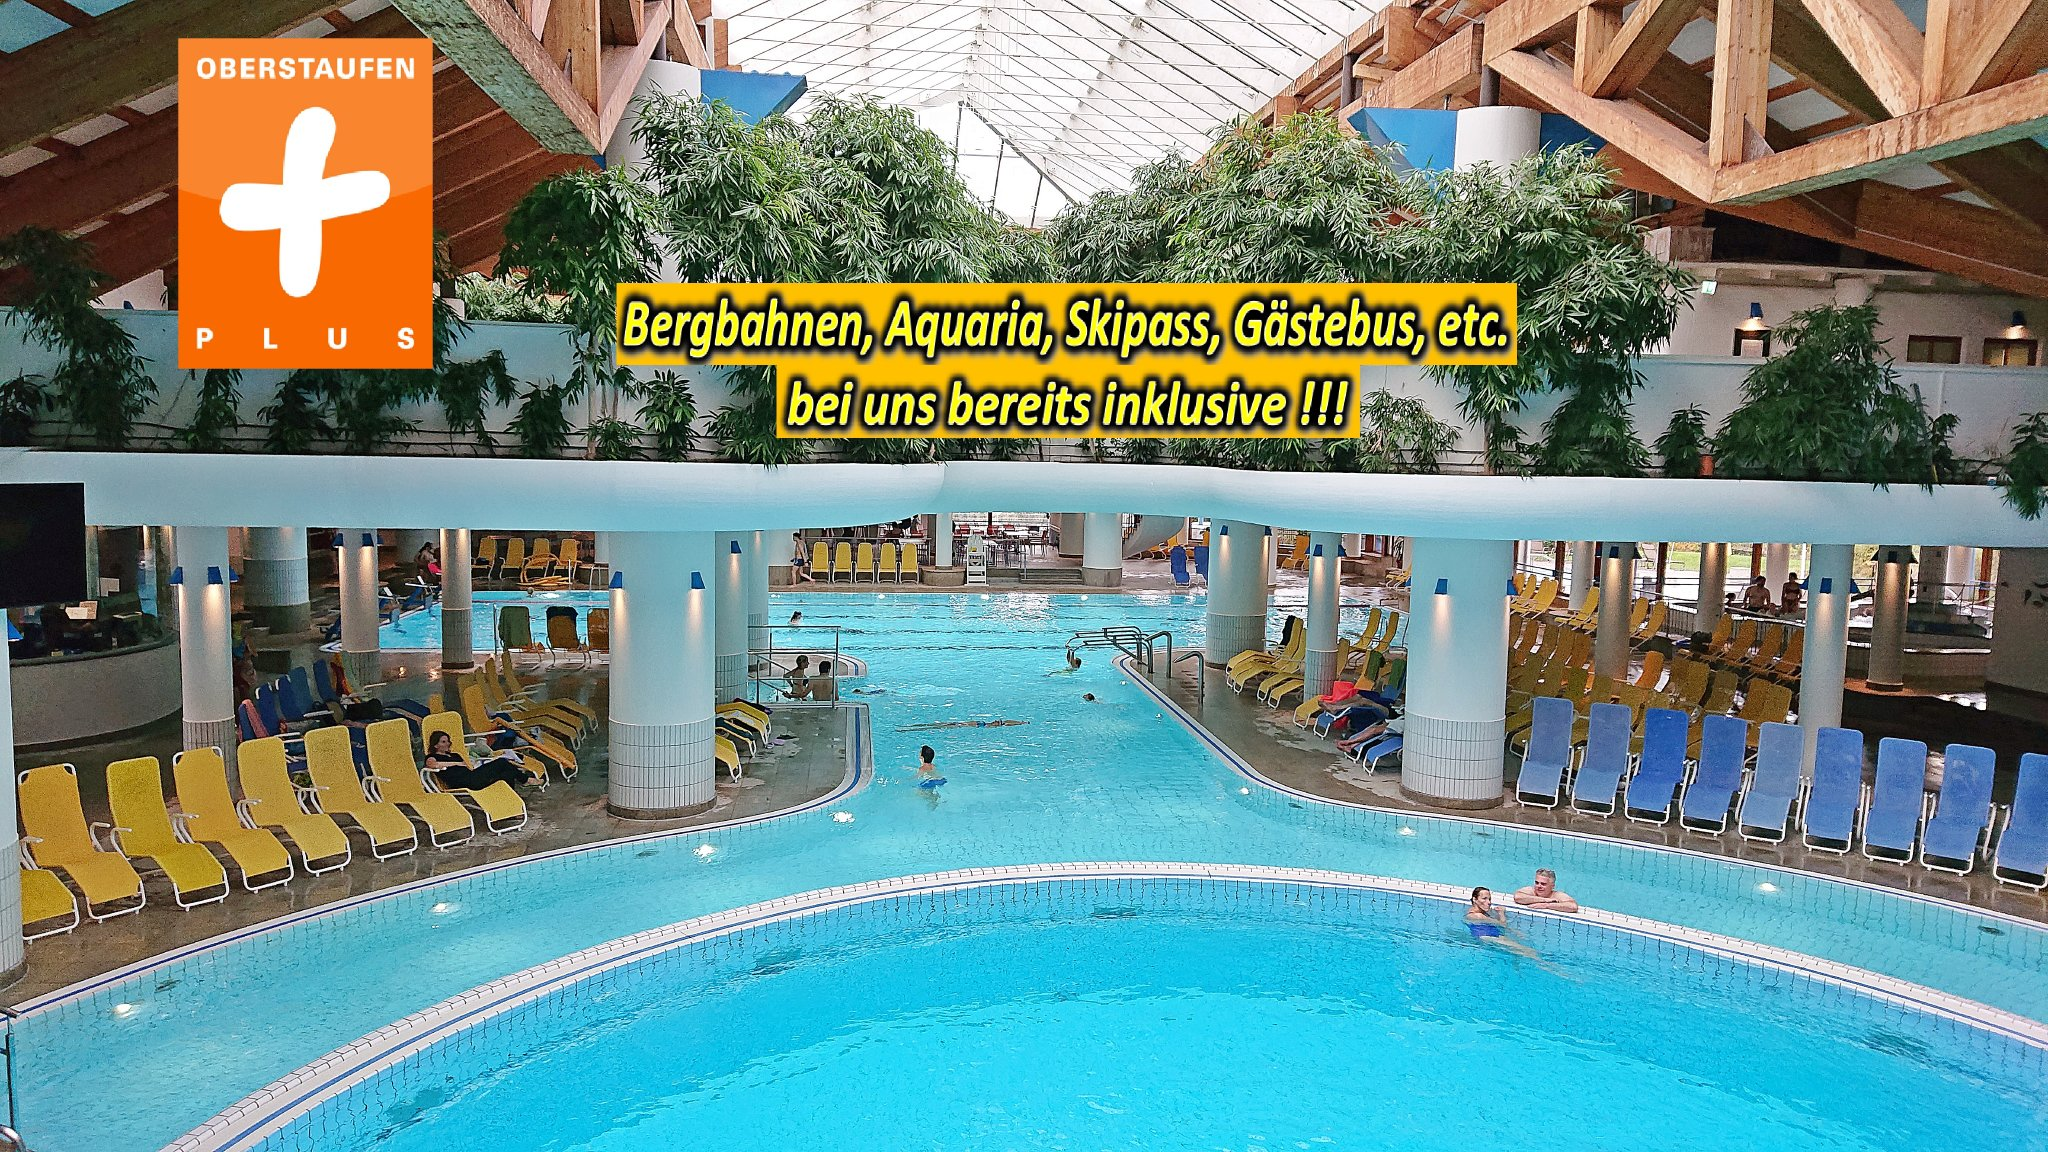 Badeland Aquaria (gratis), � Oberstaufen